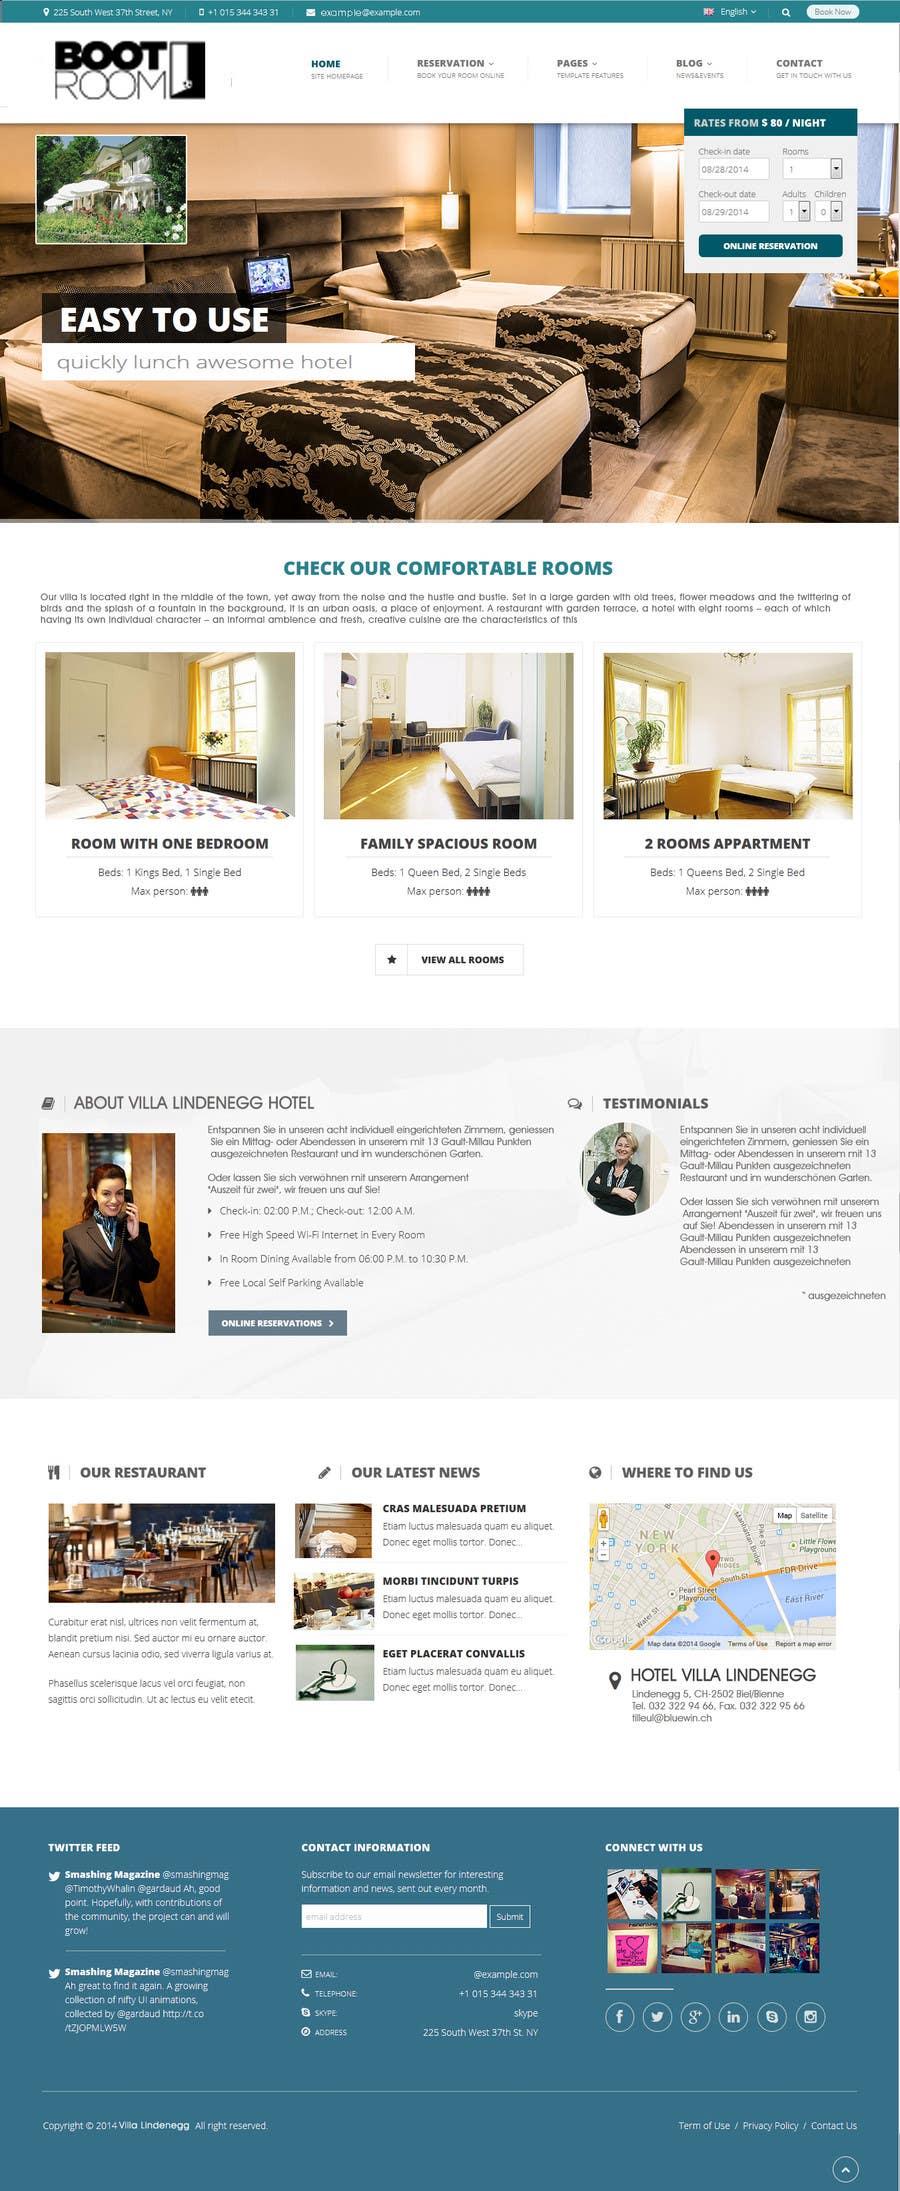 Bài tham dự cuộc thi #                                        5                                      cho                                         Revamp website & make it look premium